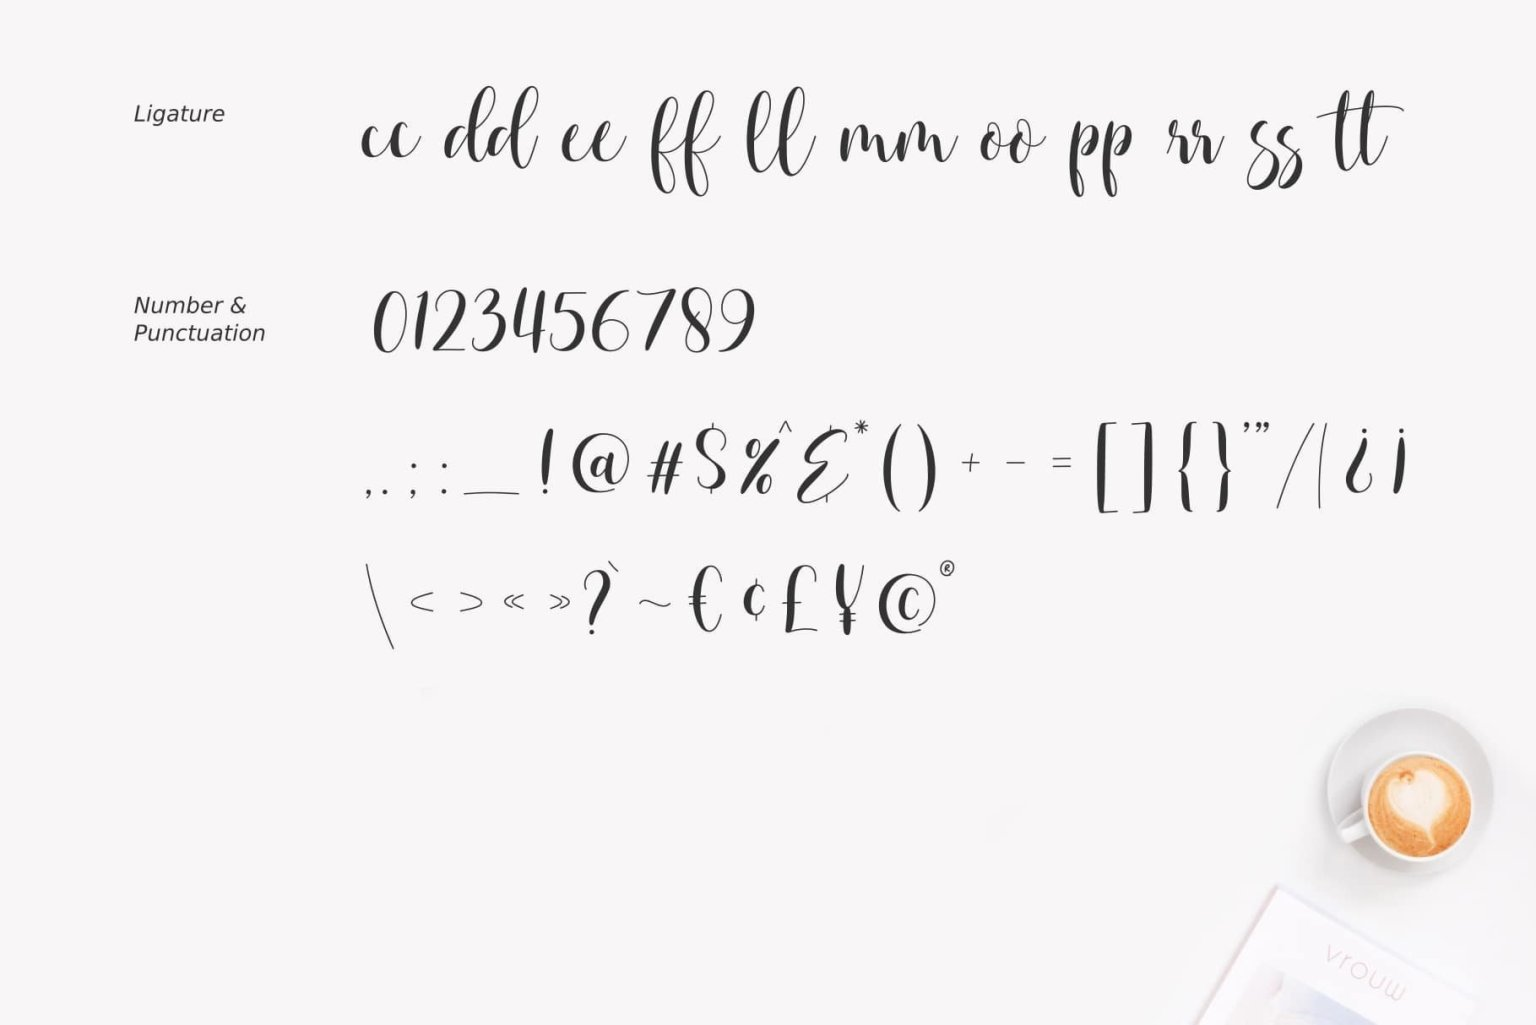 e1d7a08f7c190248b863b66327b9b5d1b1c0433f575553a9d3767ed51d4e18be (1)